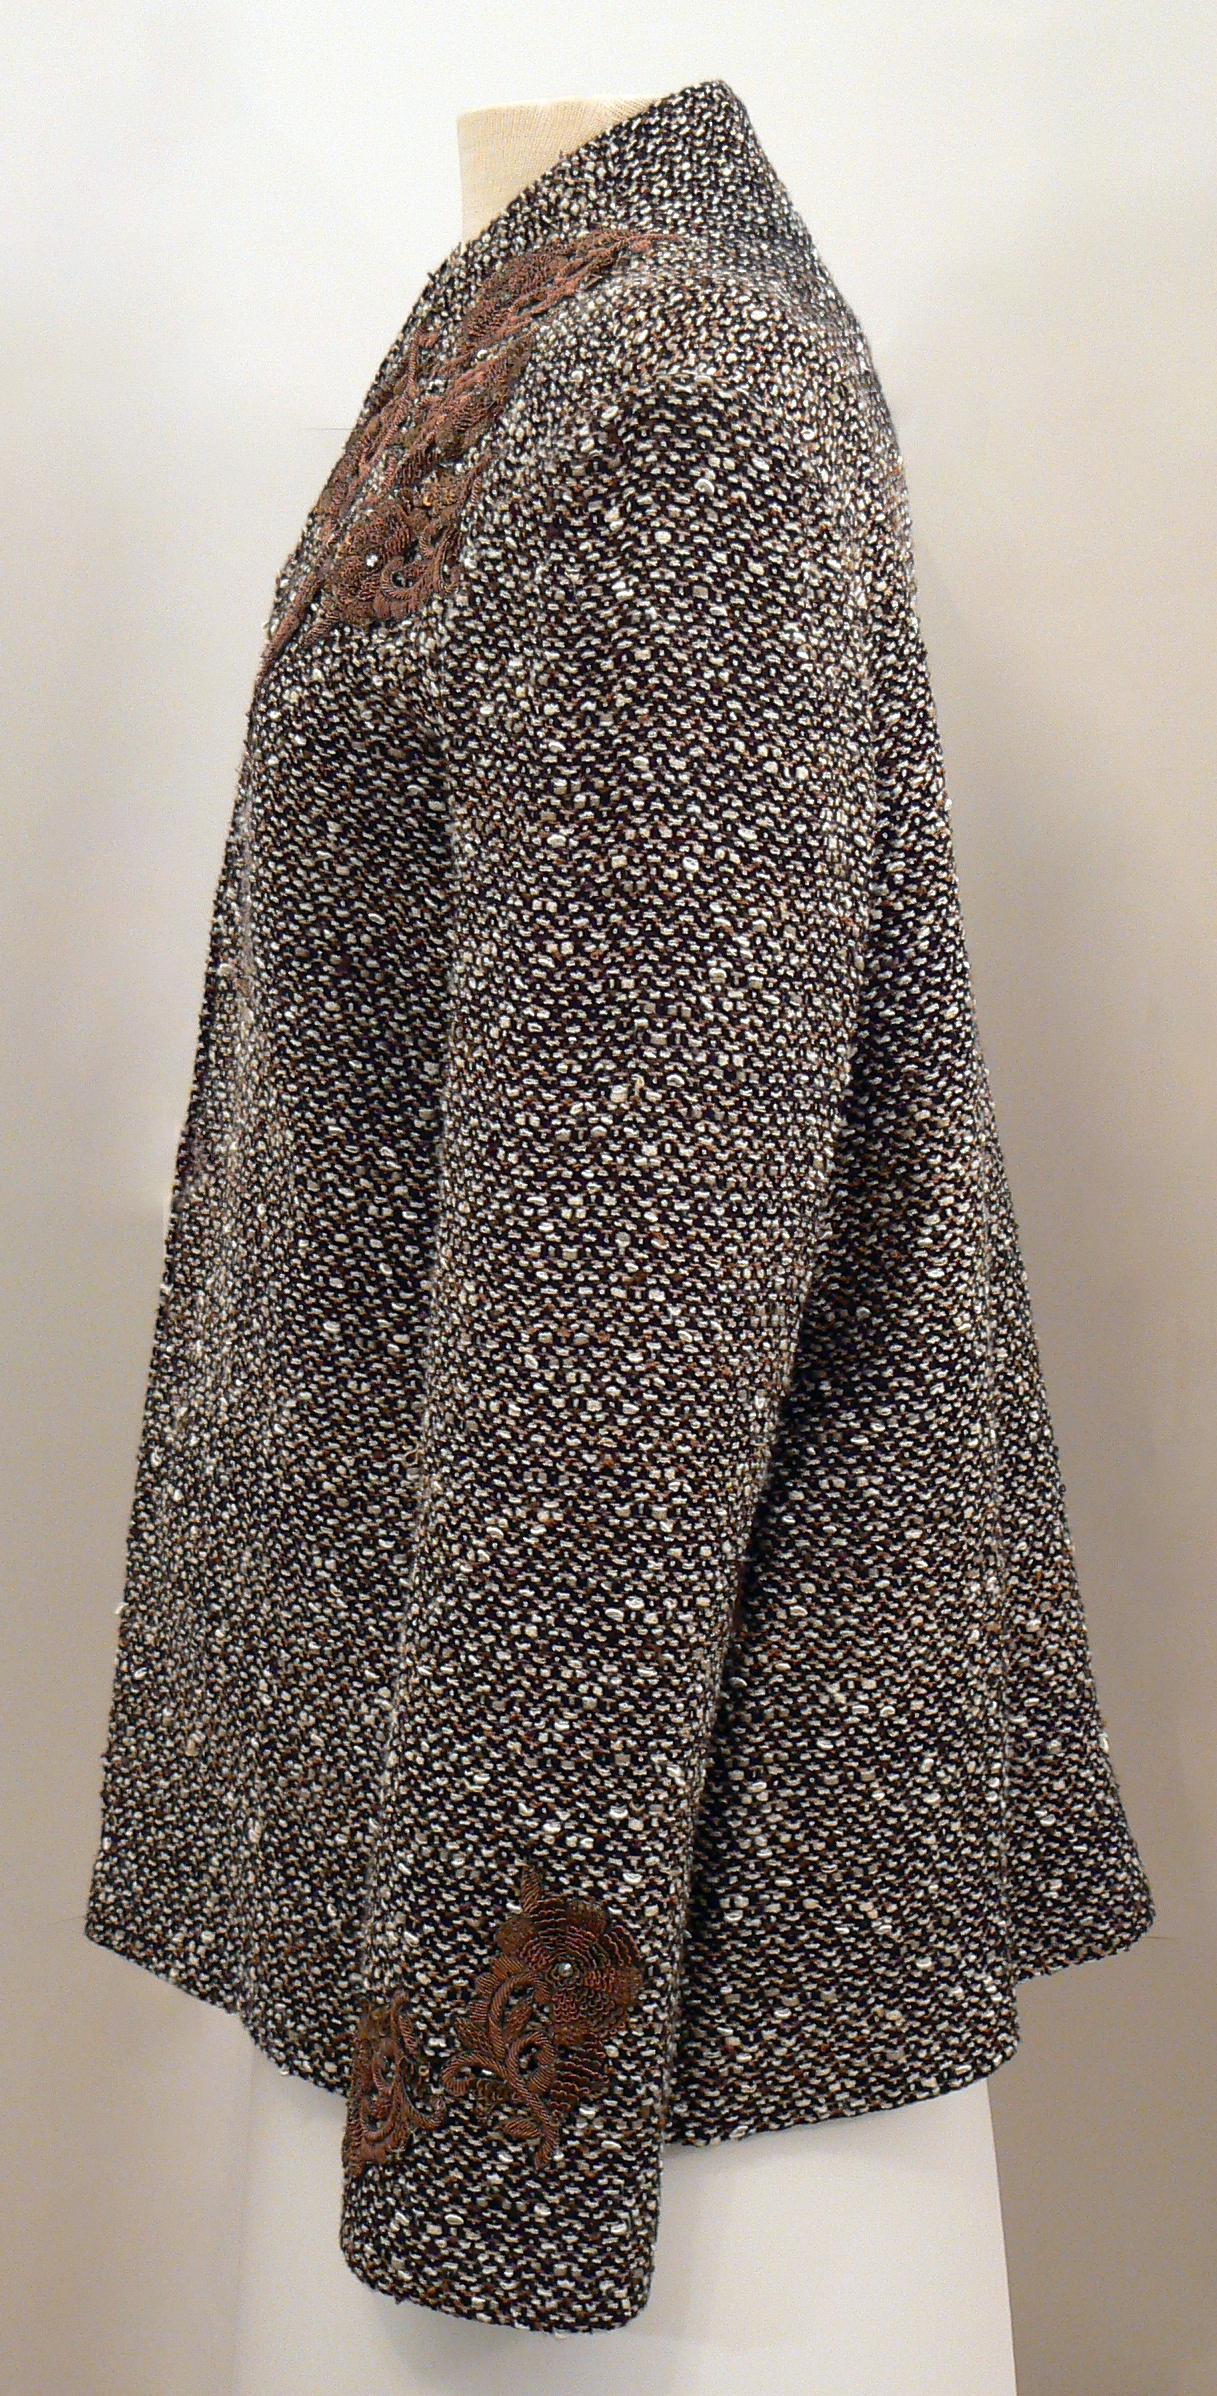 Handwoven Clothing, Wearable Art, Kathleen Weir-West, 11-001.JPG